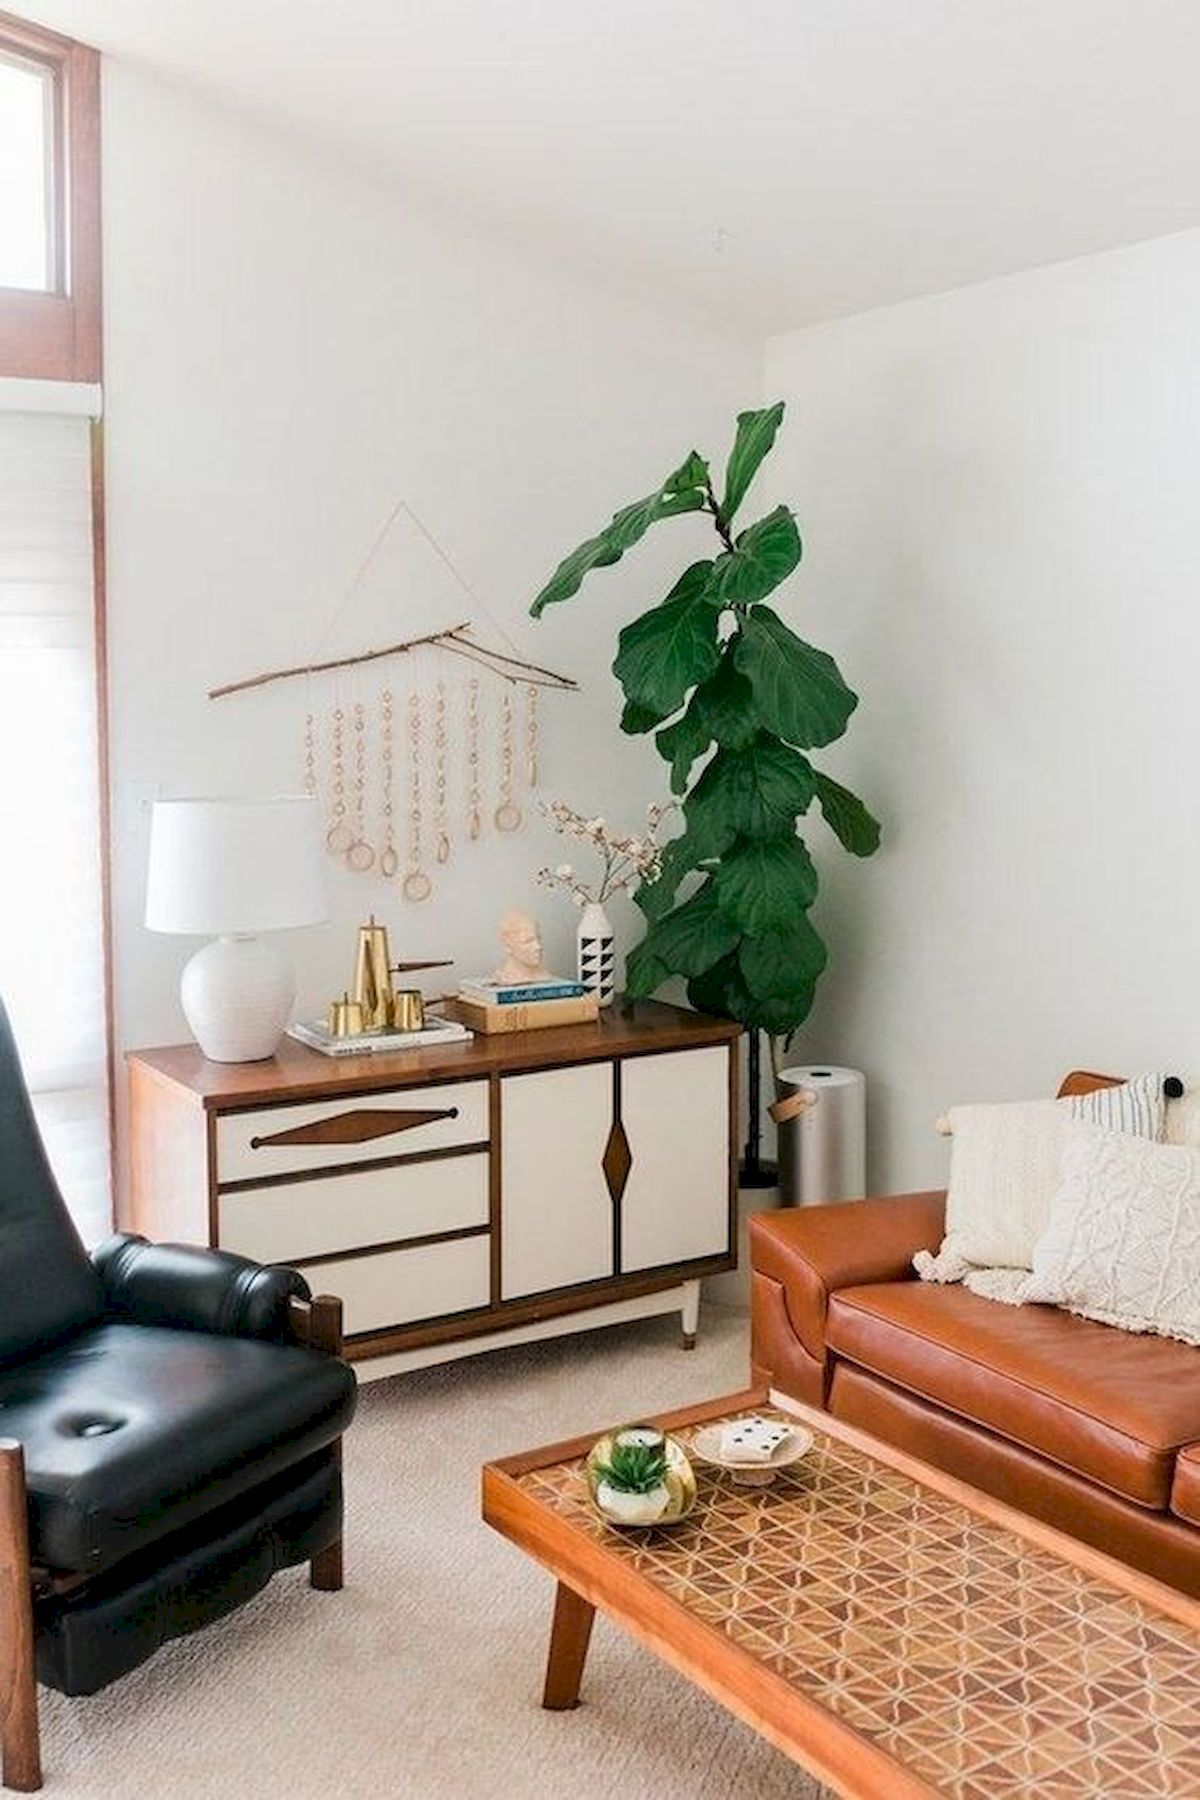 45 Brilliant DIY Living Room Design and Decor Ideas for Small Apartment (6)